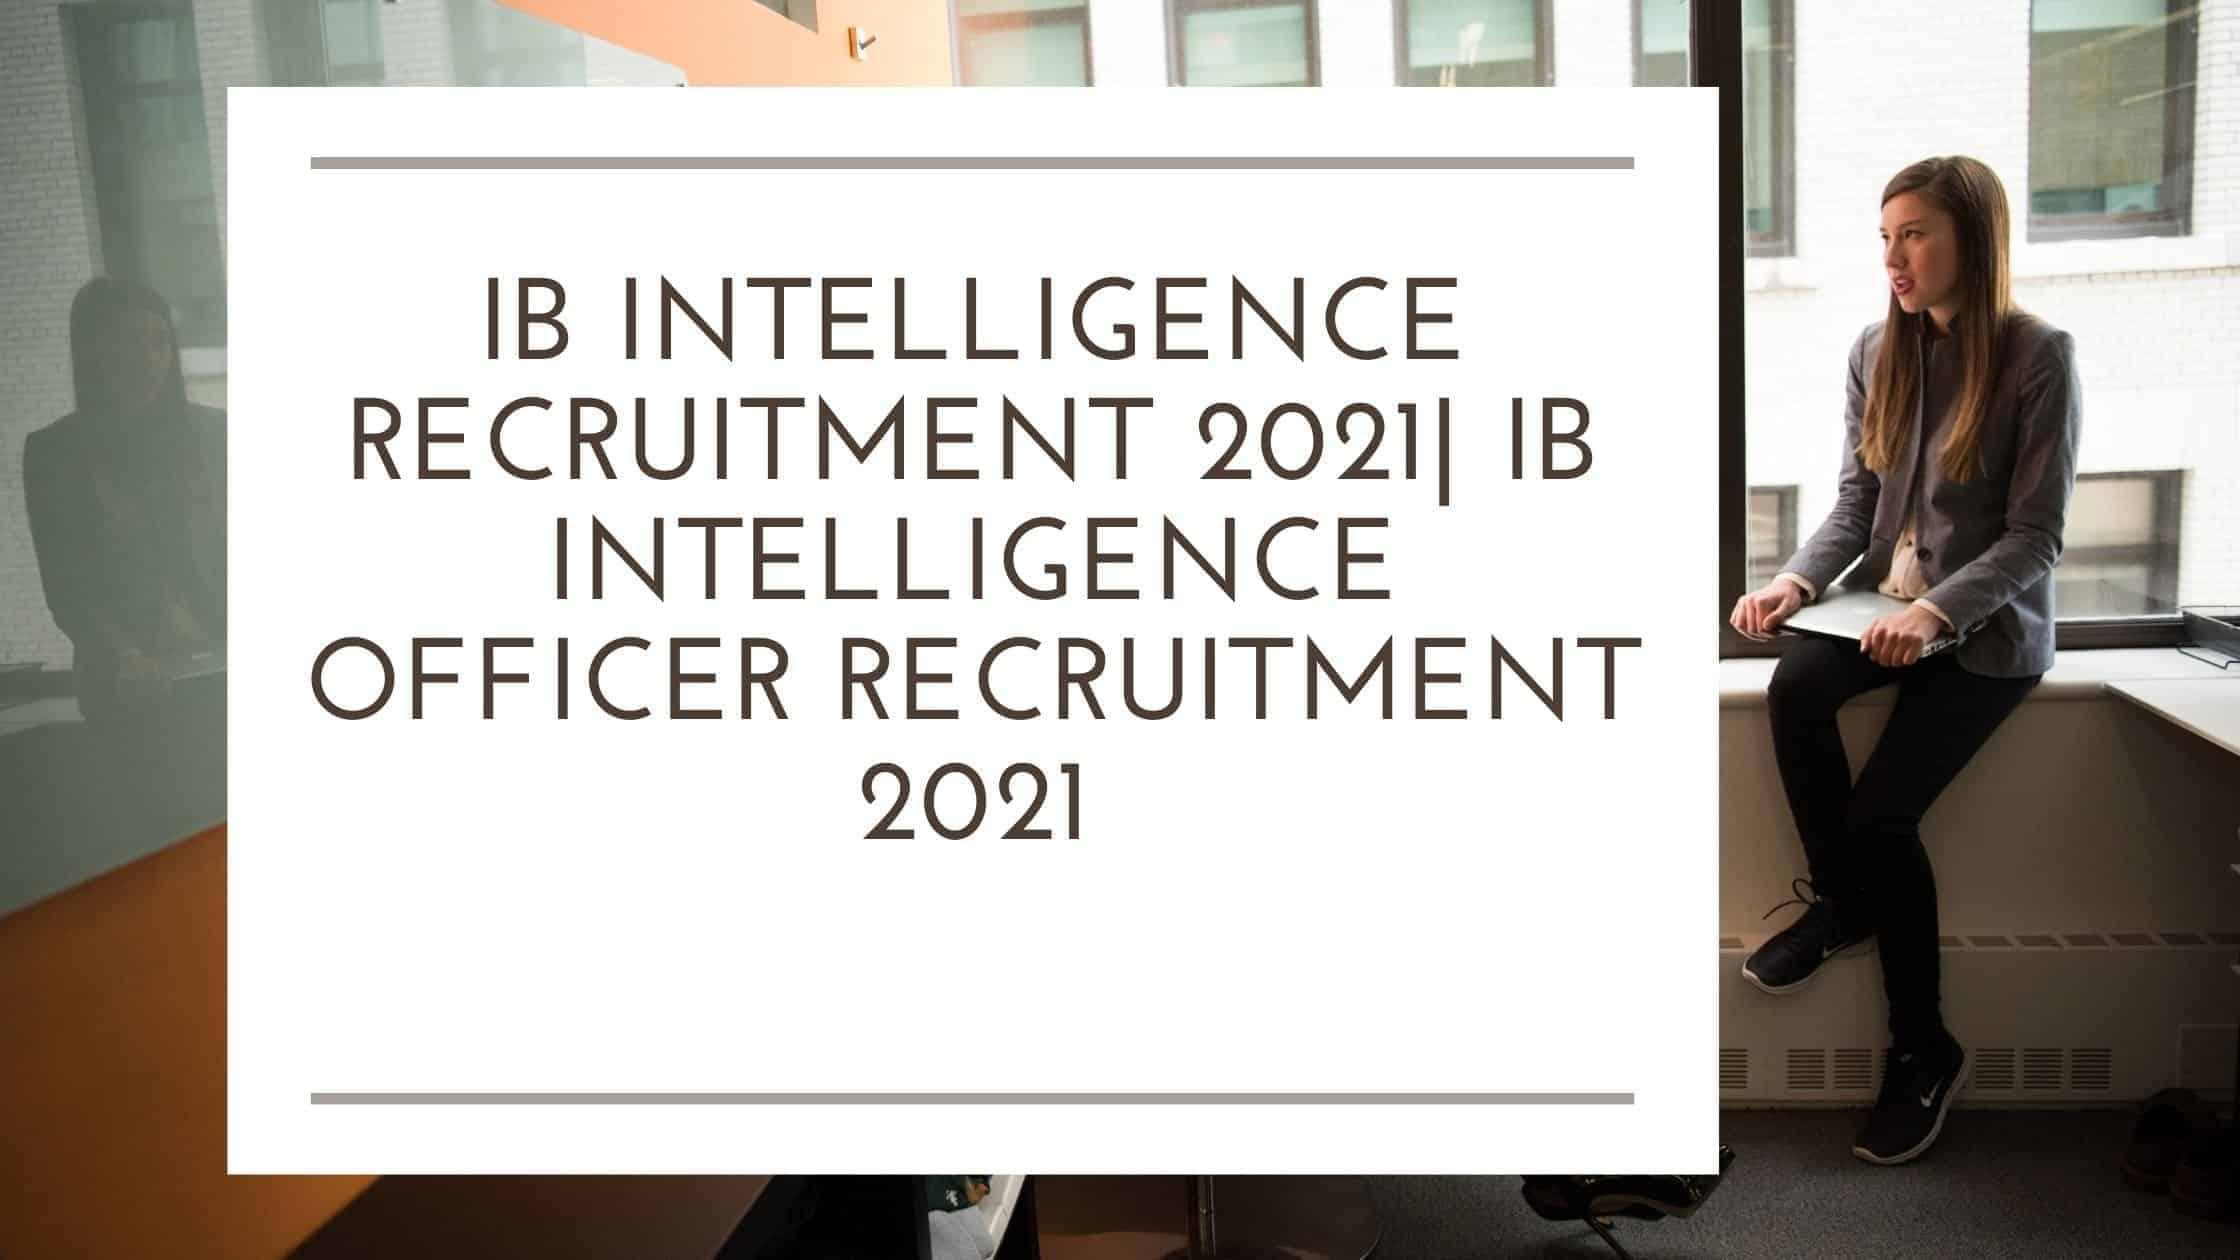 ib intelligence recruitment 2021| ib intelligence officer recruitment 2021